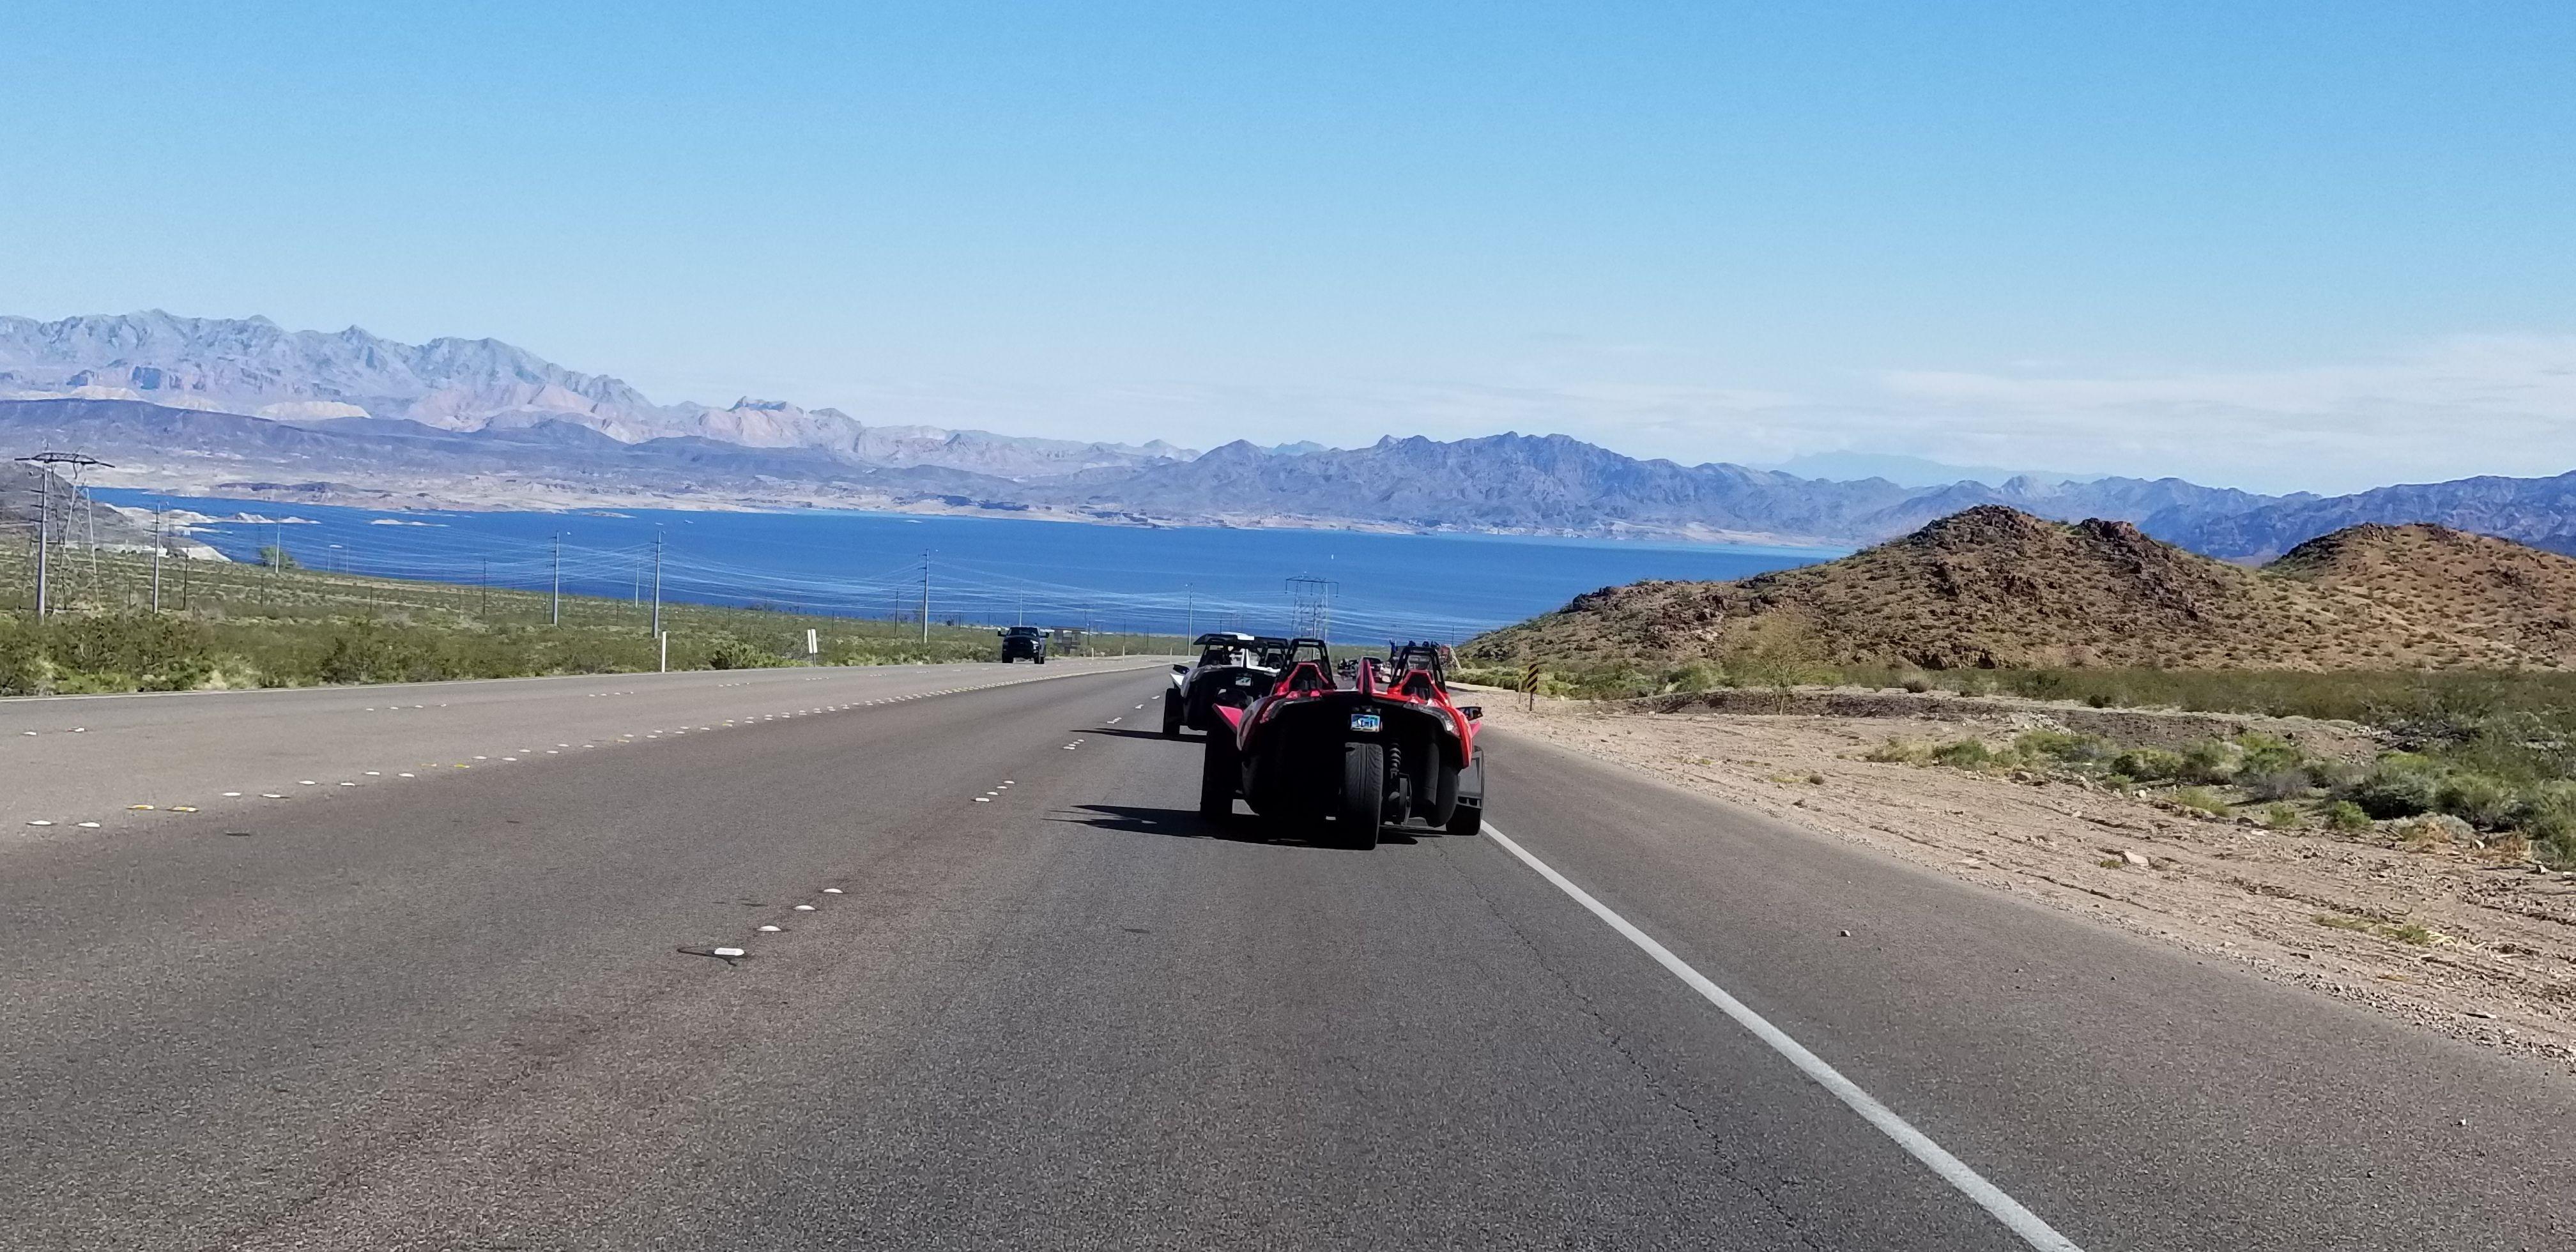 beautiful views in 2020 Las vegas tours, Lake mead